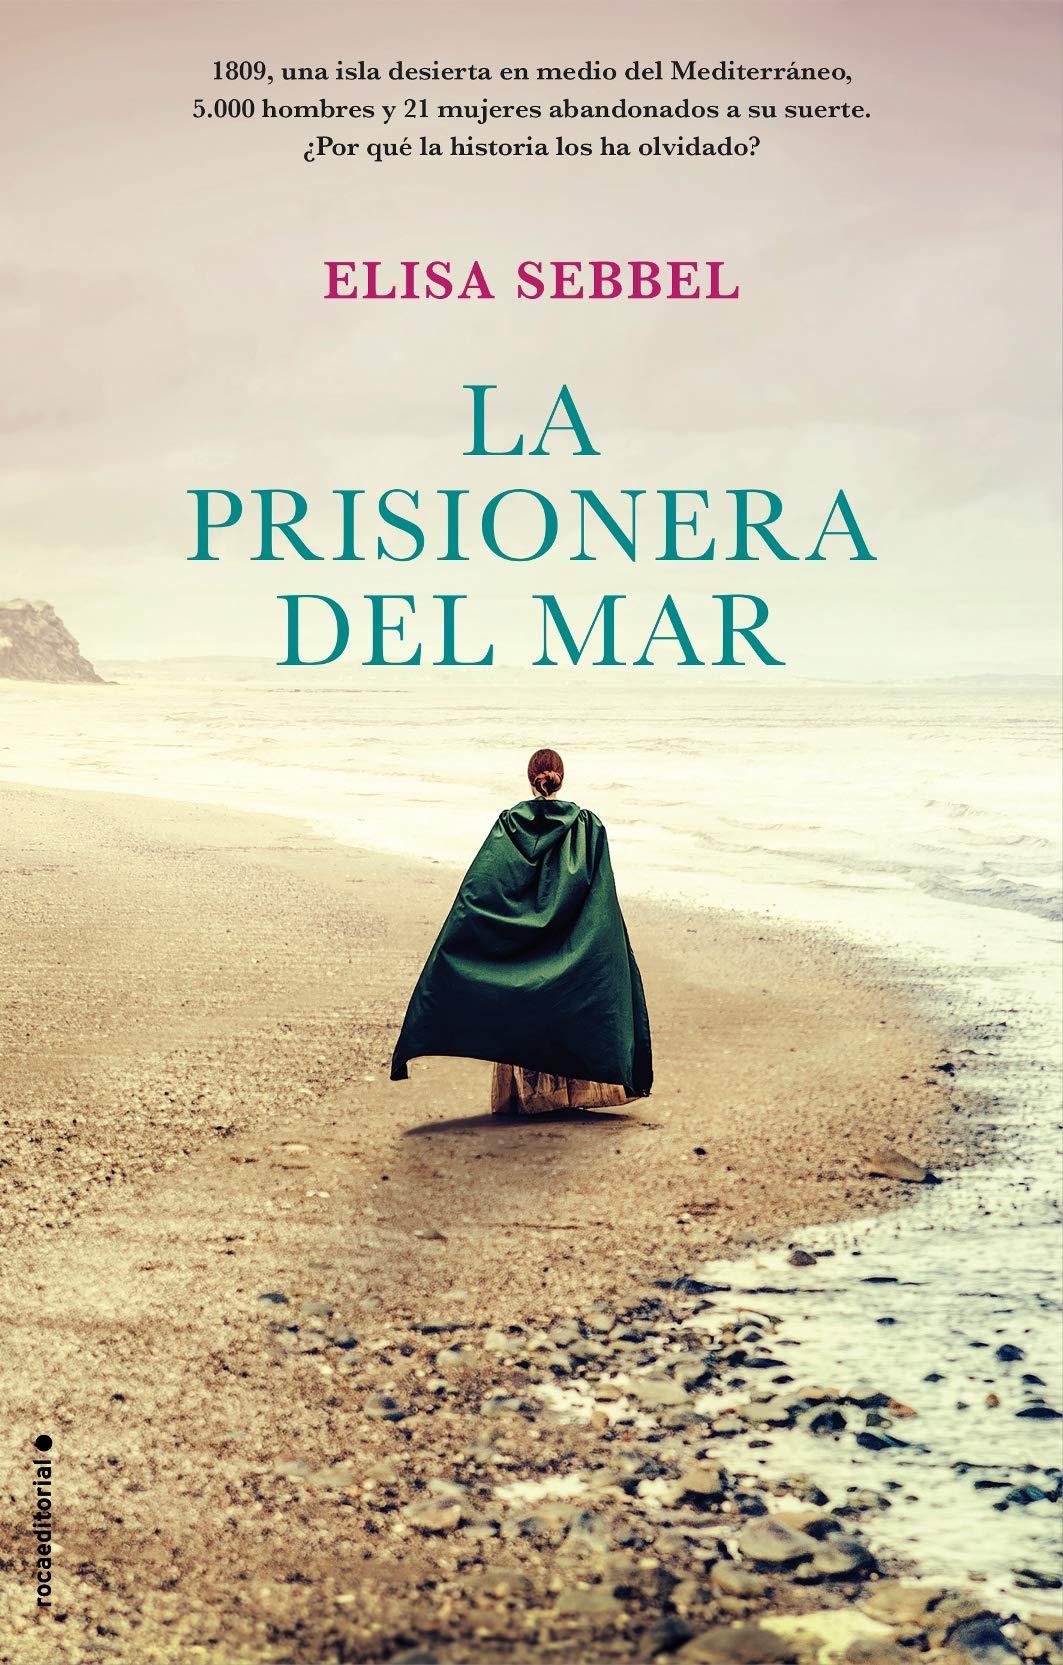 La prisionera del mar (Novela): Amazon.es: Sebbel, Elisa, Bertran Alcázar, Rosa, Bertran Alcázar, Marta: Libros